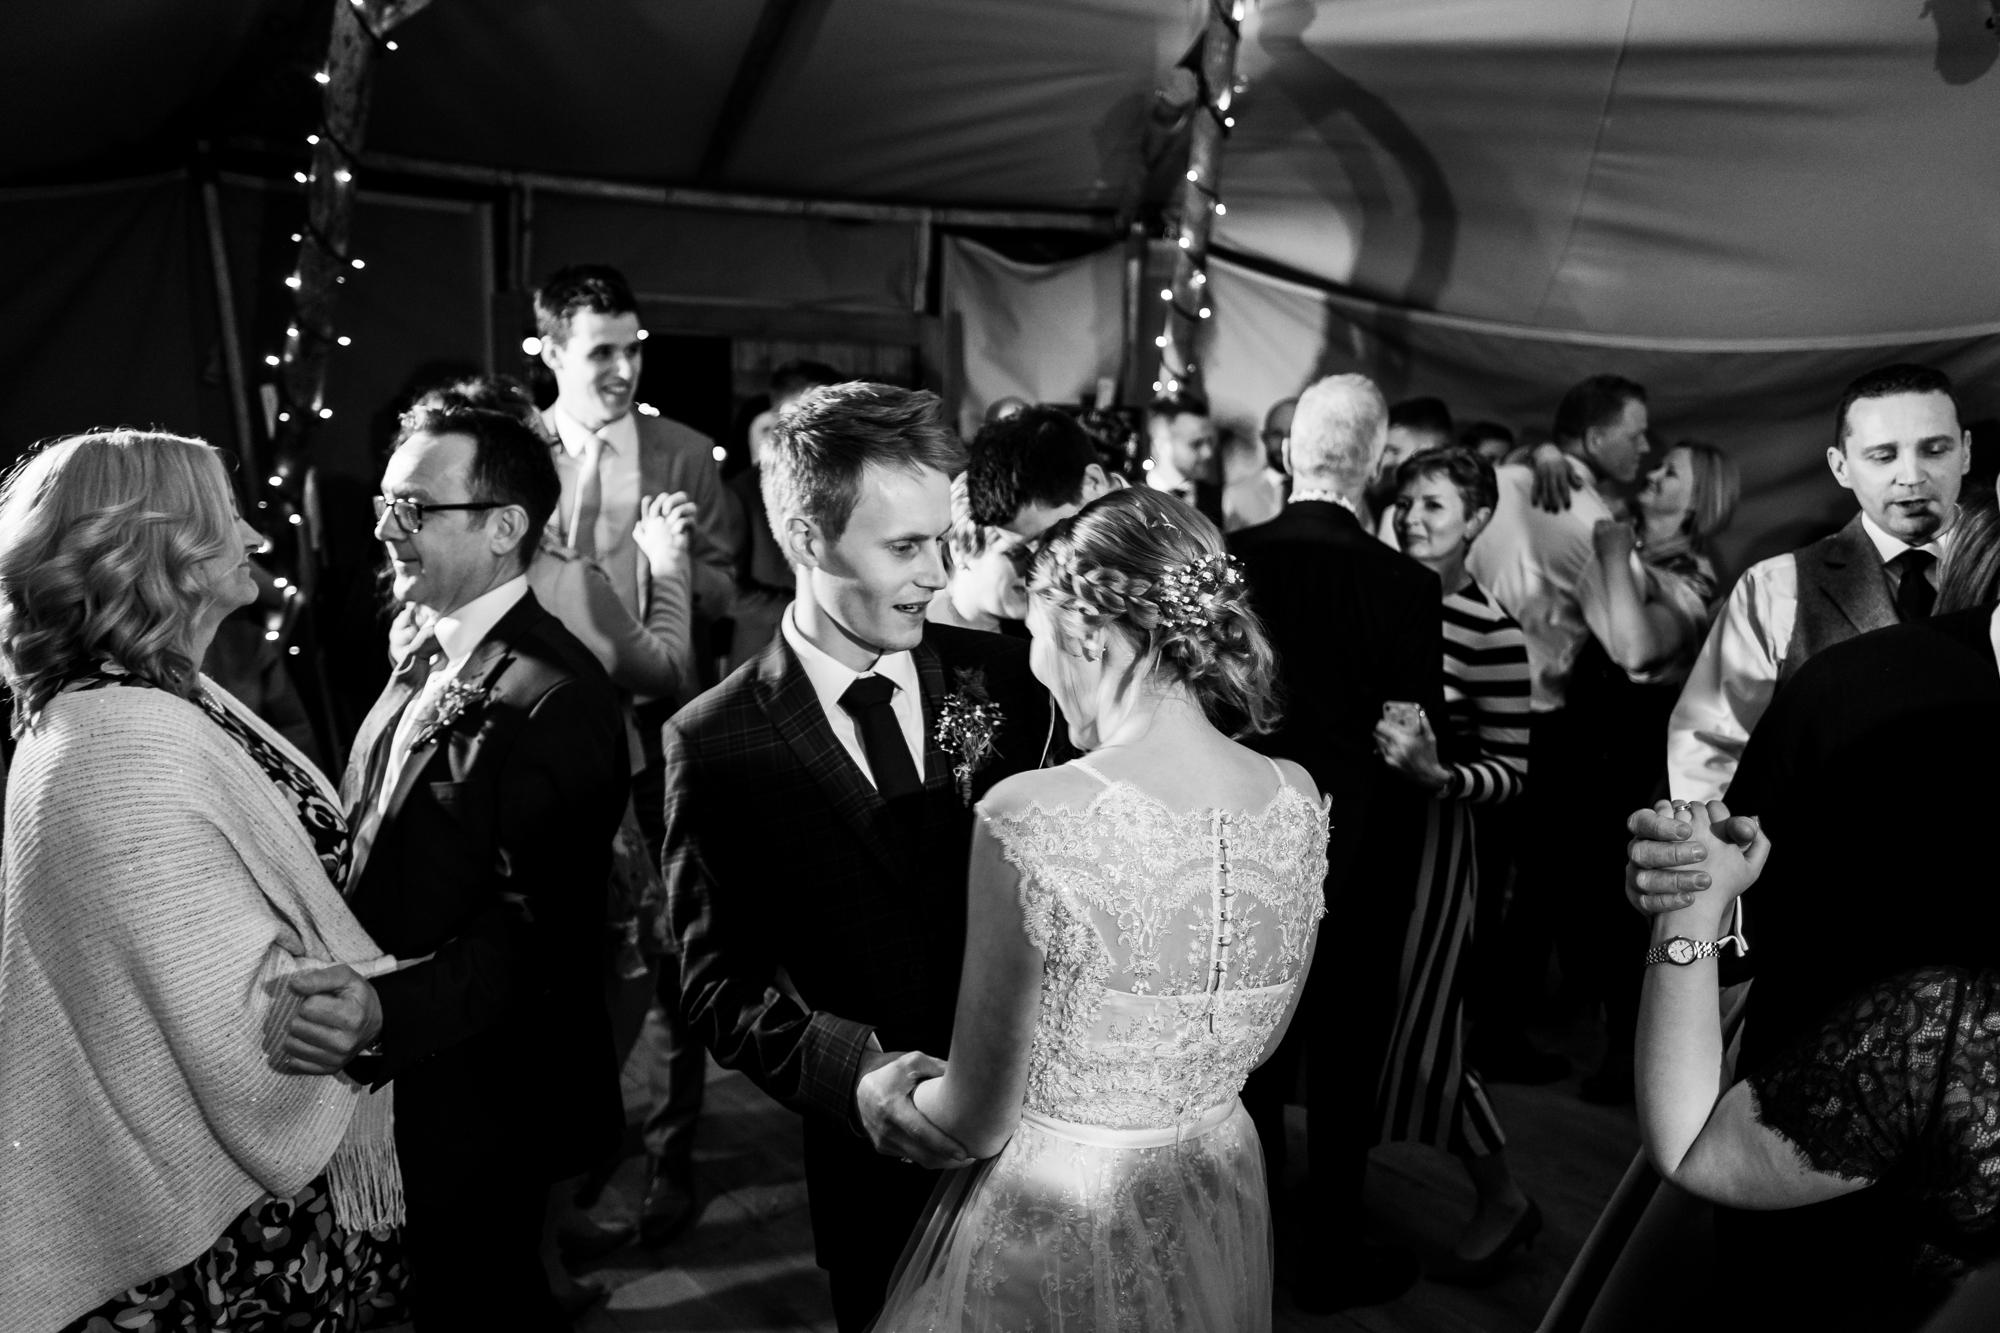 Katie and Dode weddings (195 of 207).jpg